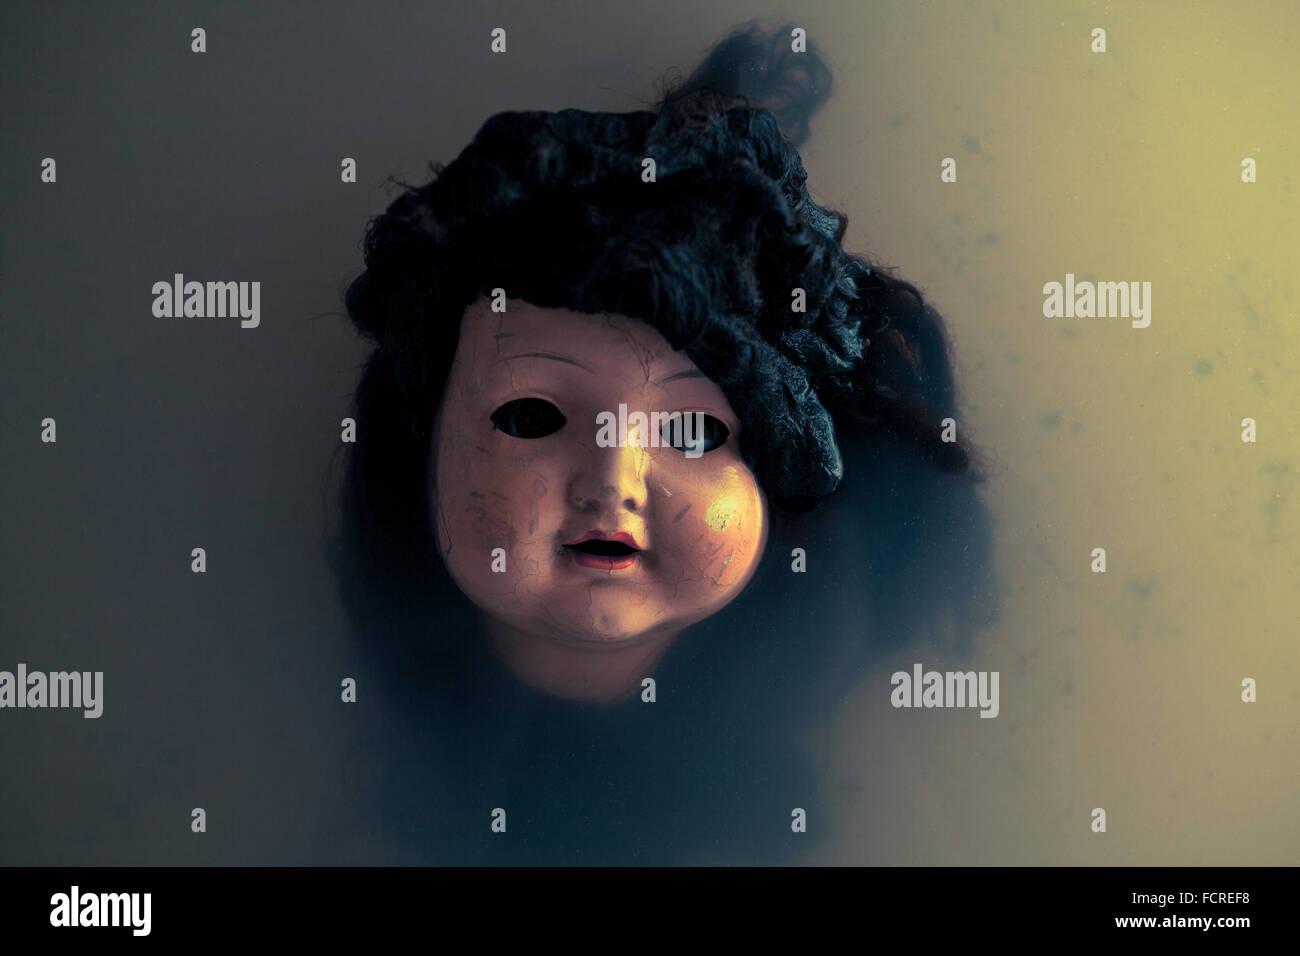 Creepy doll face - Stock Image